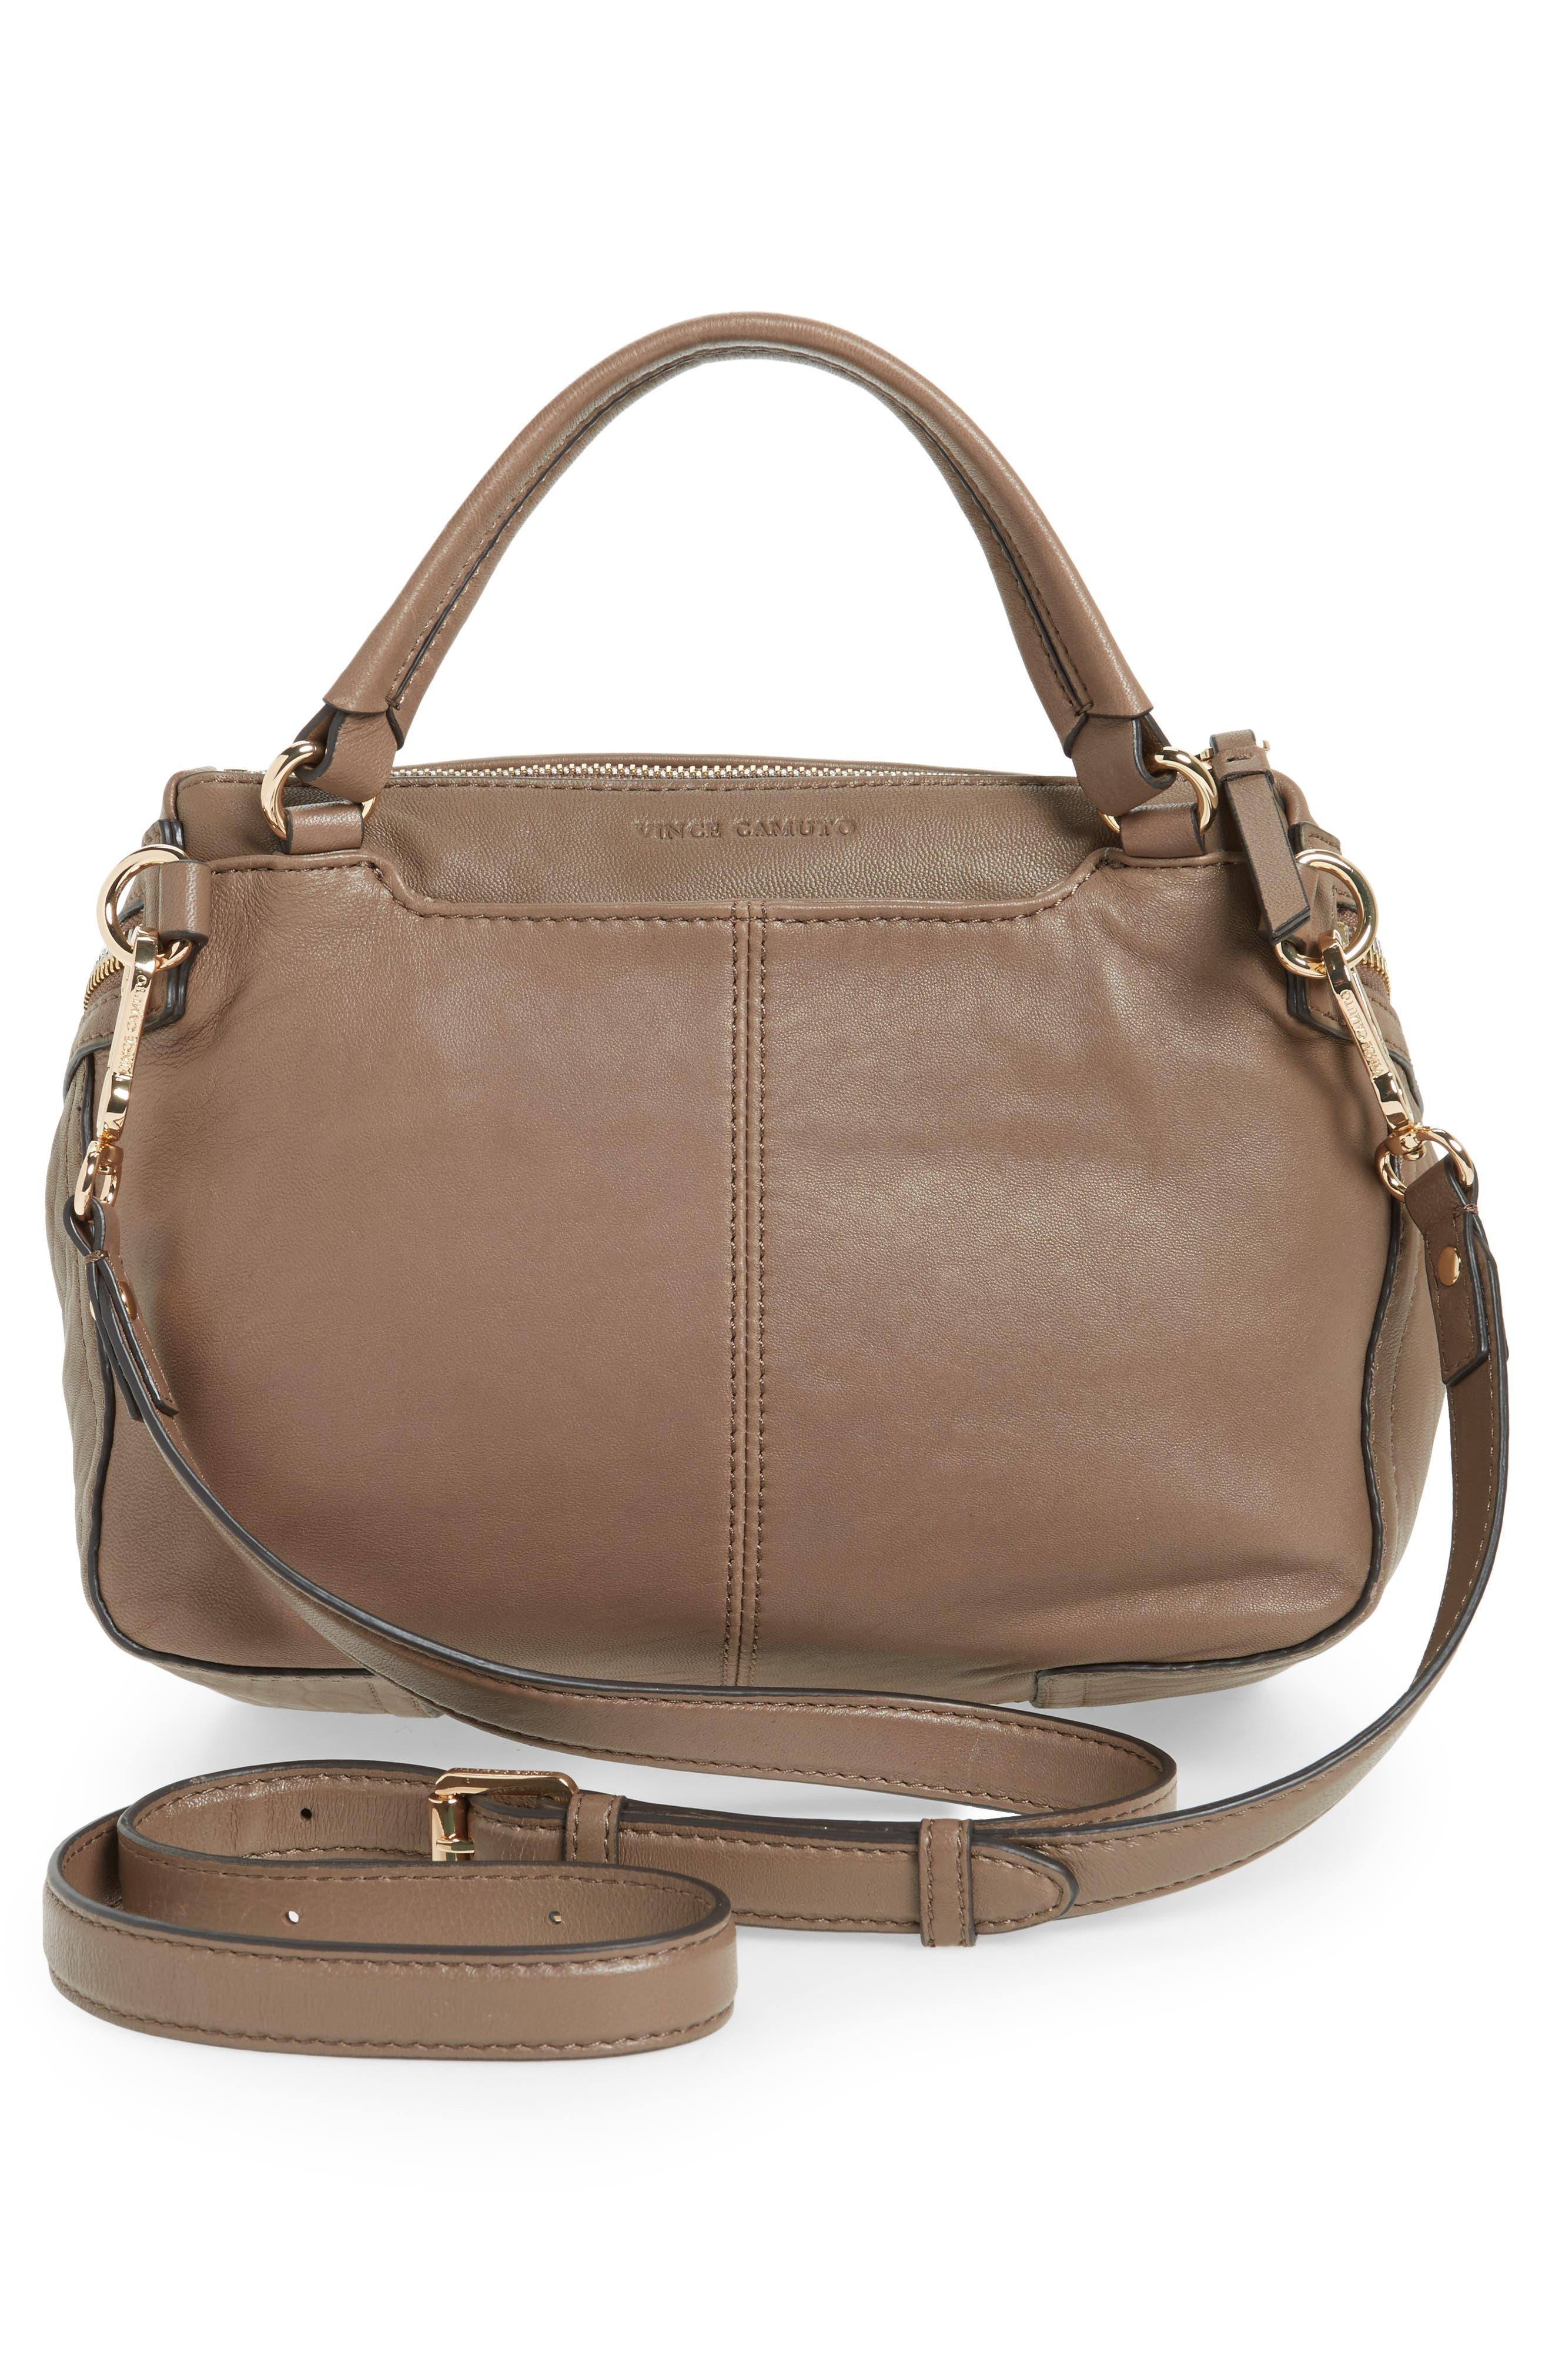 Alternate Image 3  - Vince Camuto Medium Patch Leather Crossbody Bag